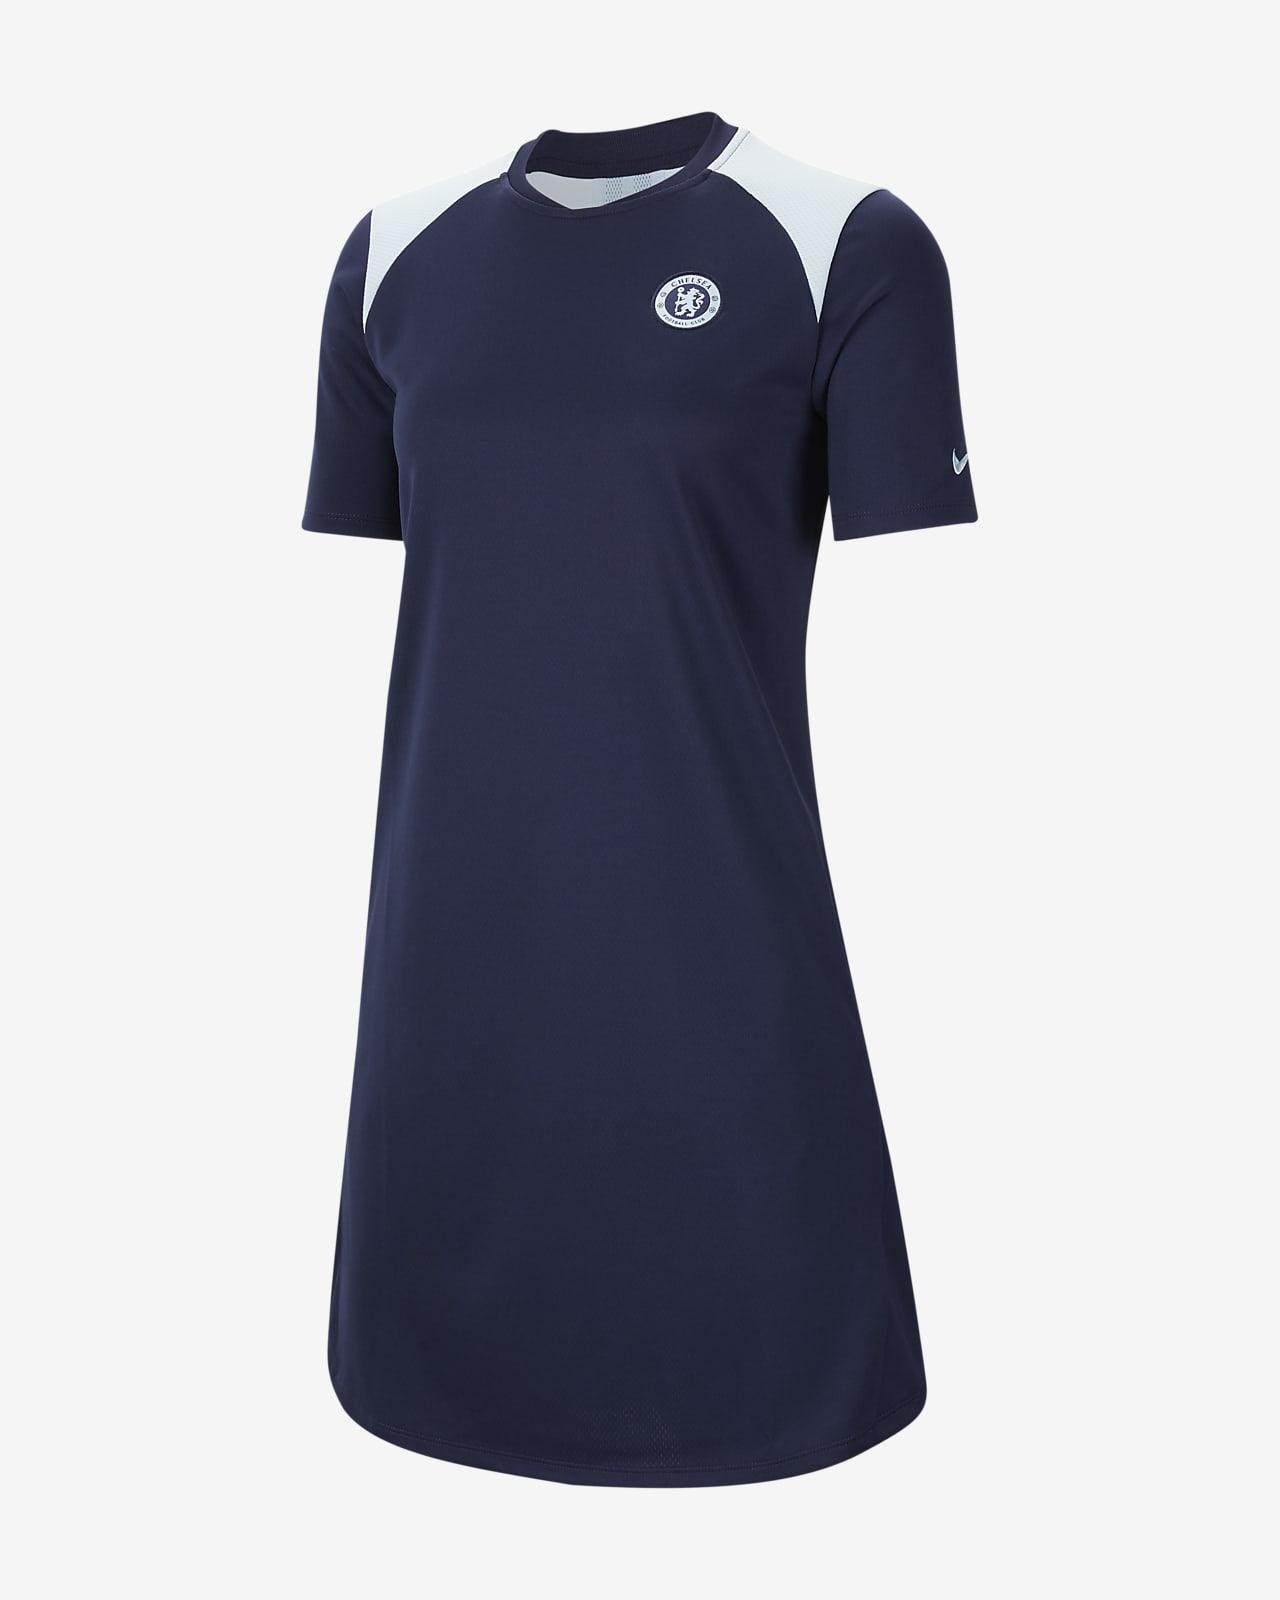 Chelsea F.C. Women's Football Shirt Dress